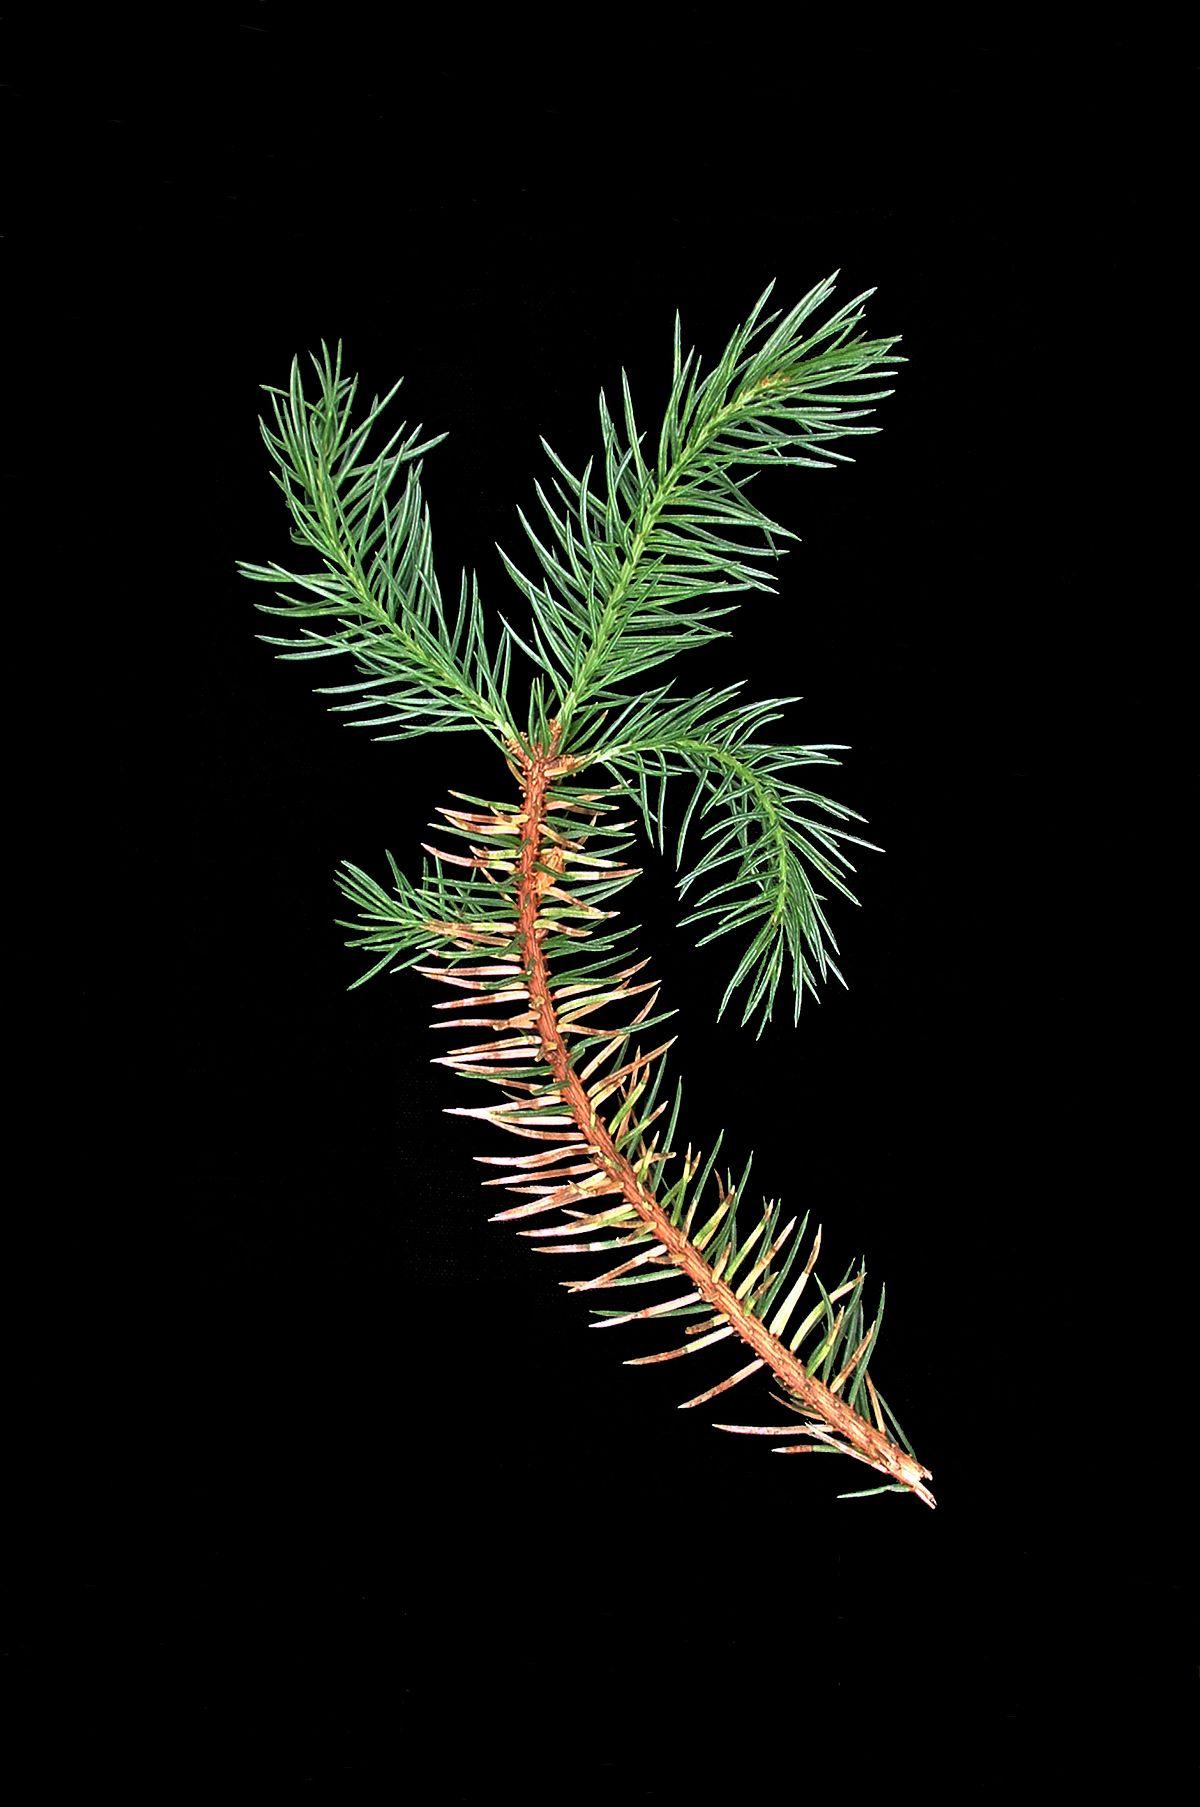 Chrysomyxa Weirii Wikipedia